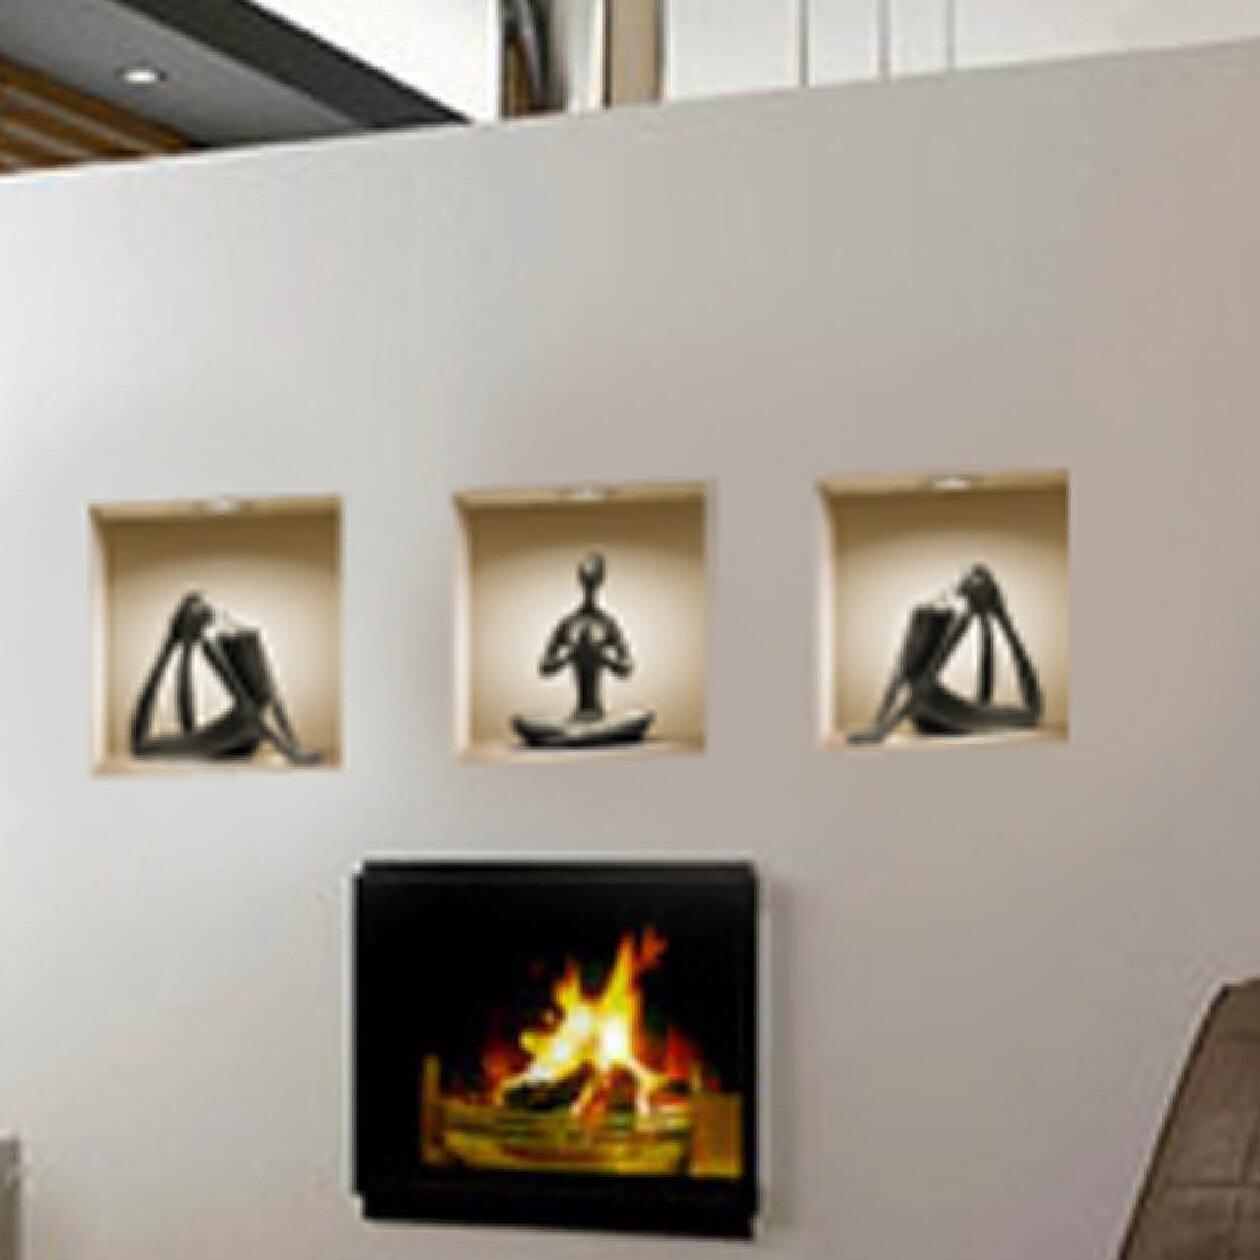 Ceramic Figure Wall Decals 3D effect